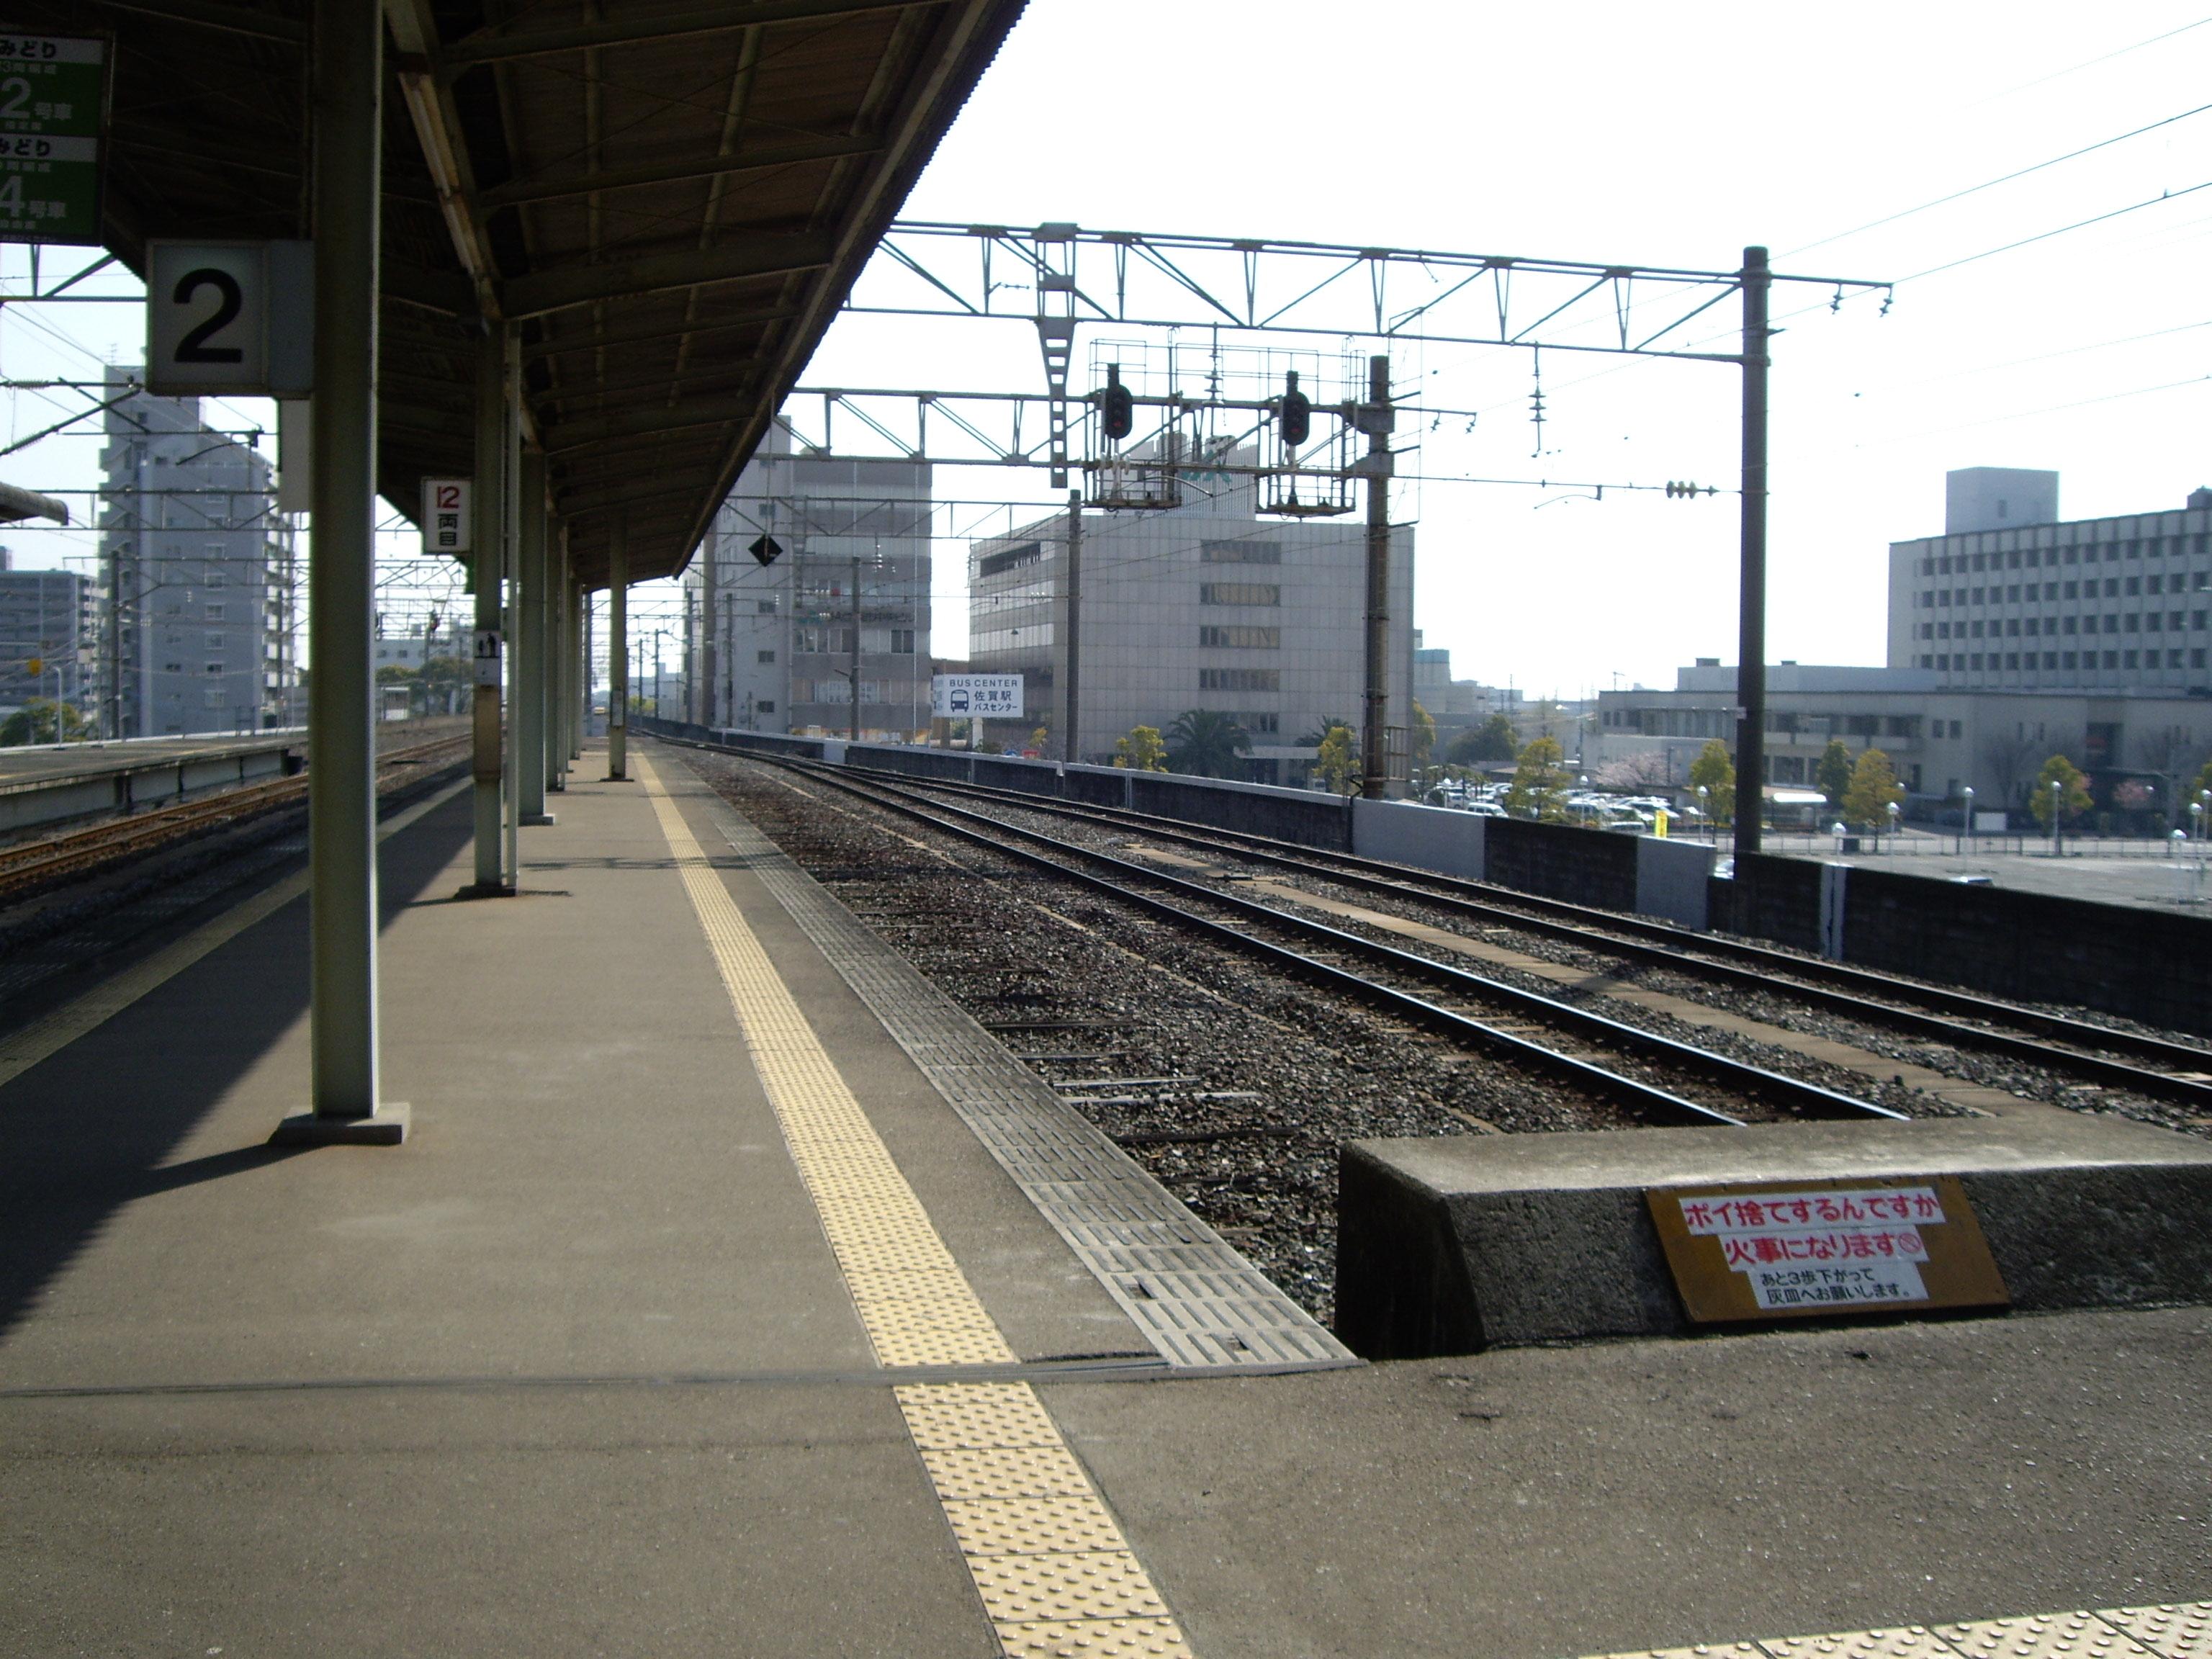 https://upload.wikimedia.org/wikipedia/commons/9/92/Saga_Line_Old_Platform.JPG